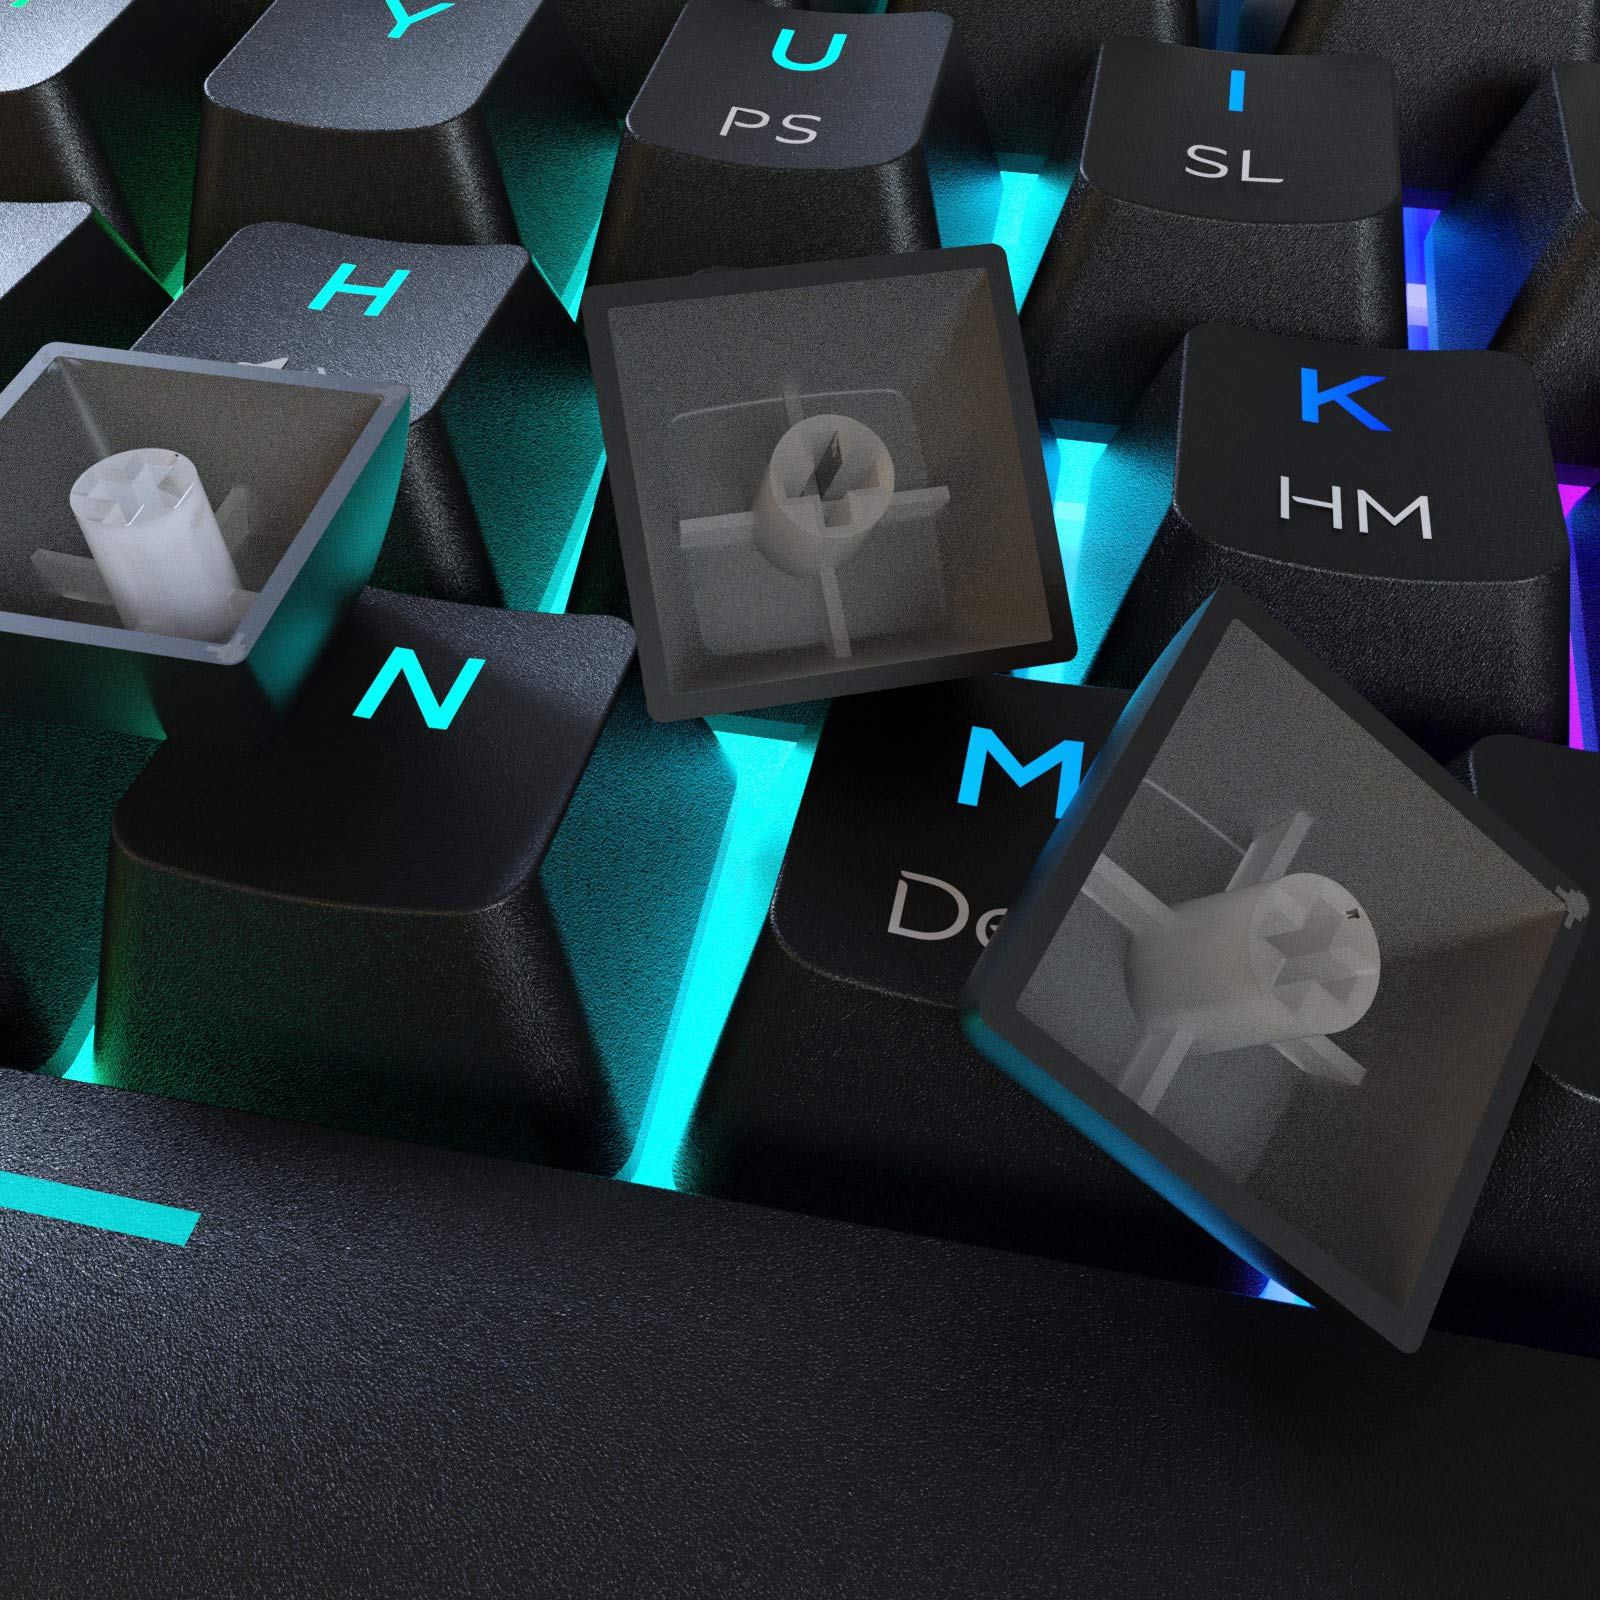 Dierya DK61 Pro Bluetooth 5.1 Mechanical Gaming Keyboard 60% Wireless/Wired PBT Keycap RGB Backlit Compact 61 Keys Computer Mini Keyboard with Full Keys Programmable (Gateron Optical Blue Switch)